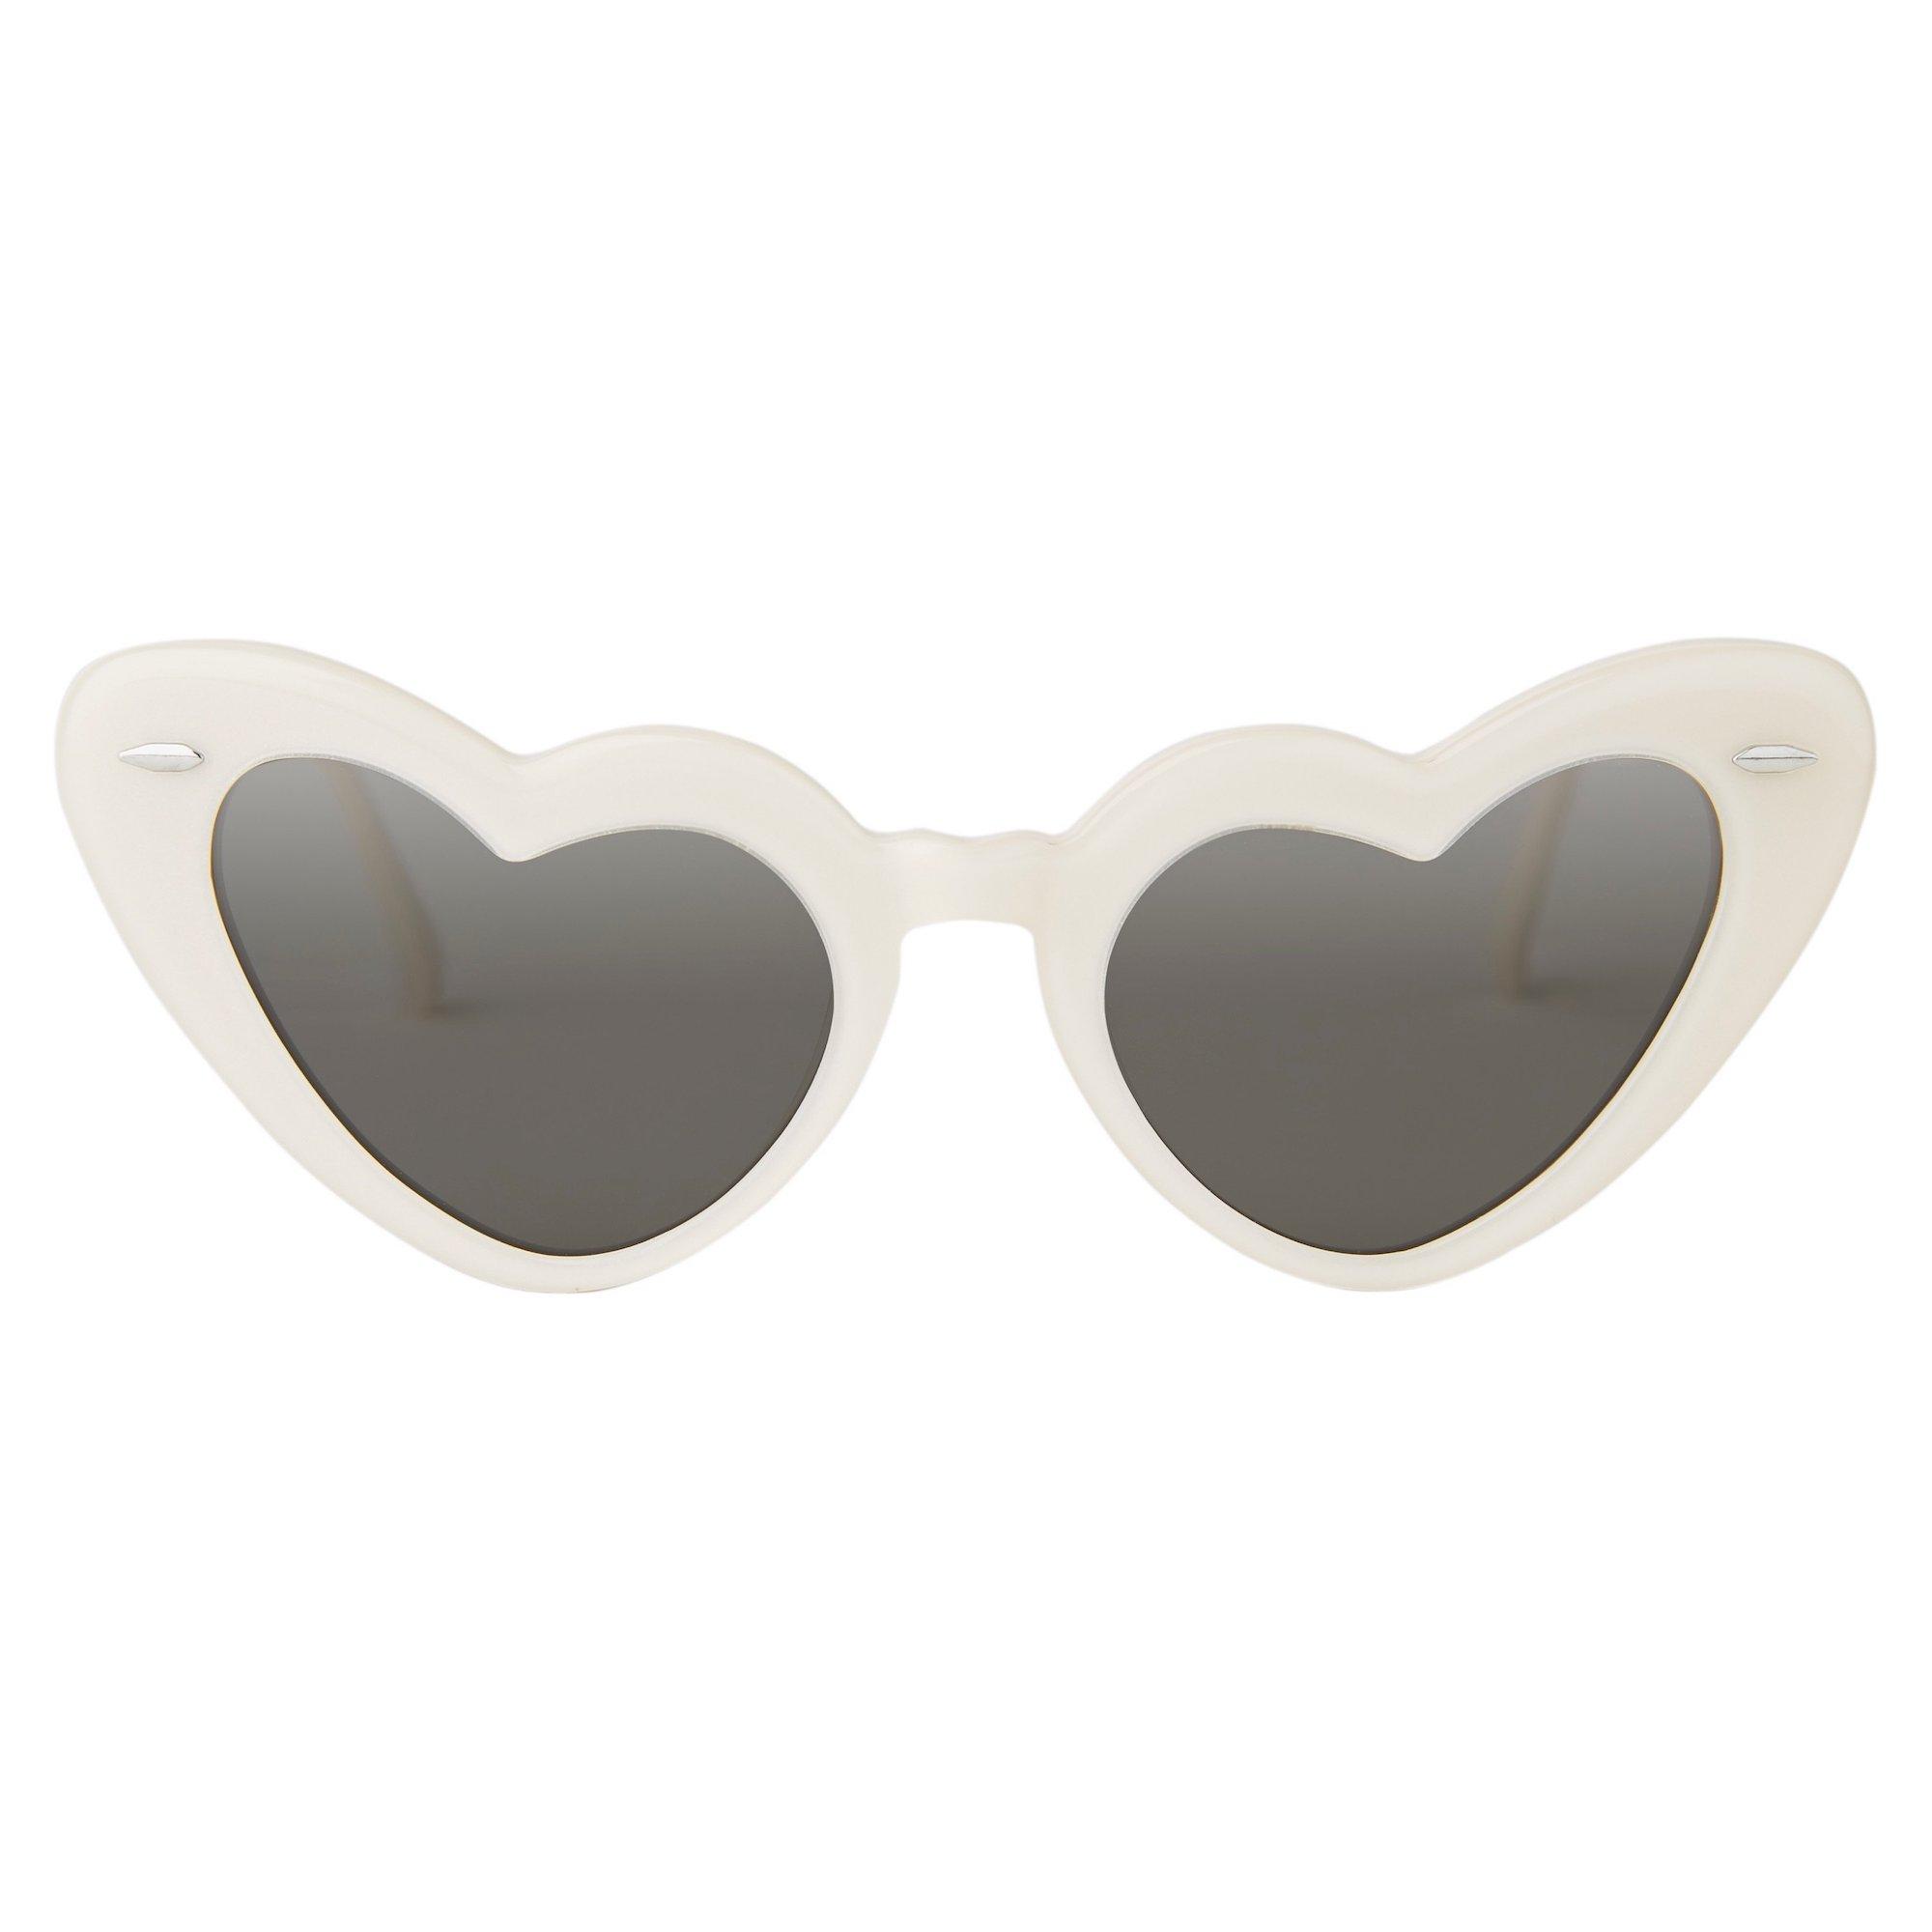 takesh eyewearinstagram takesh eyewearstockists takesh eyewearpress contact takeshheart sunglasses buy shop online influencer pink